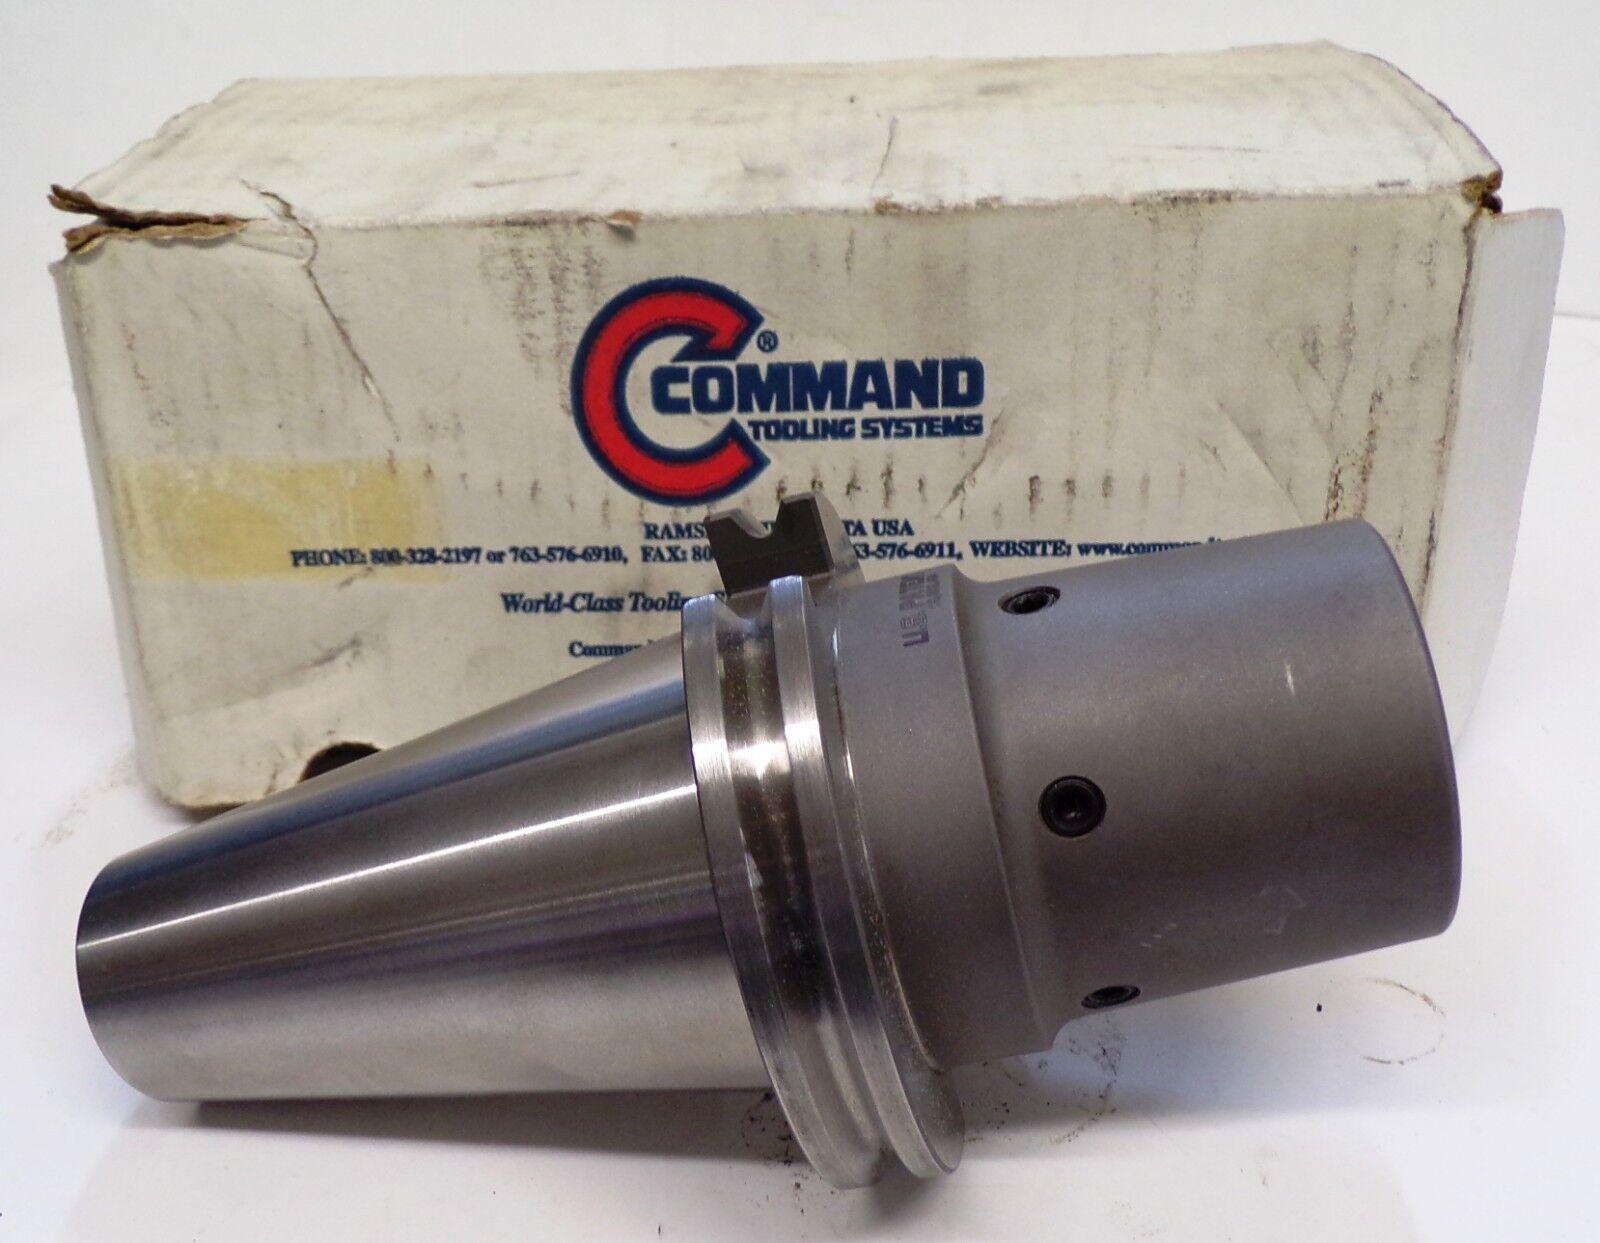 COMMAND TOOL HOLDER, 128694, 26908-6